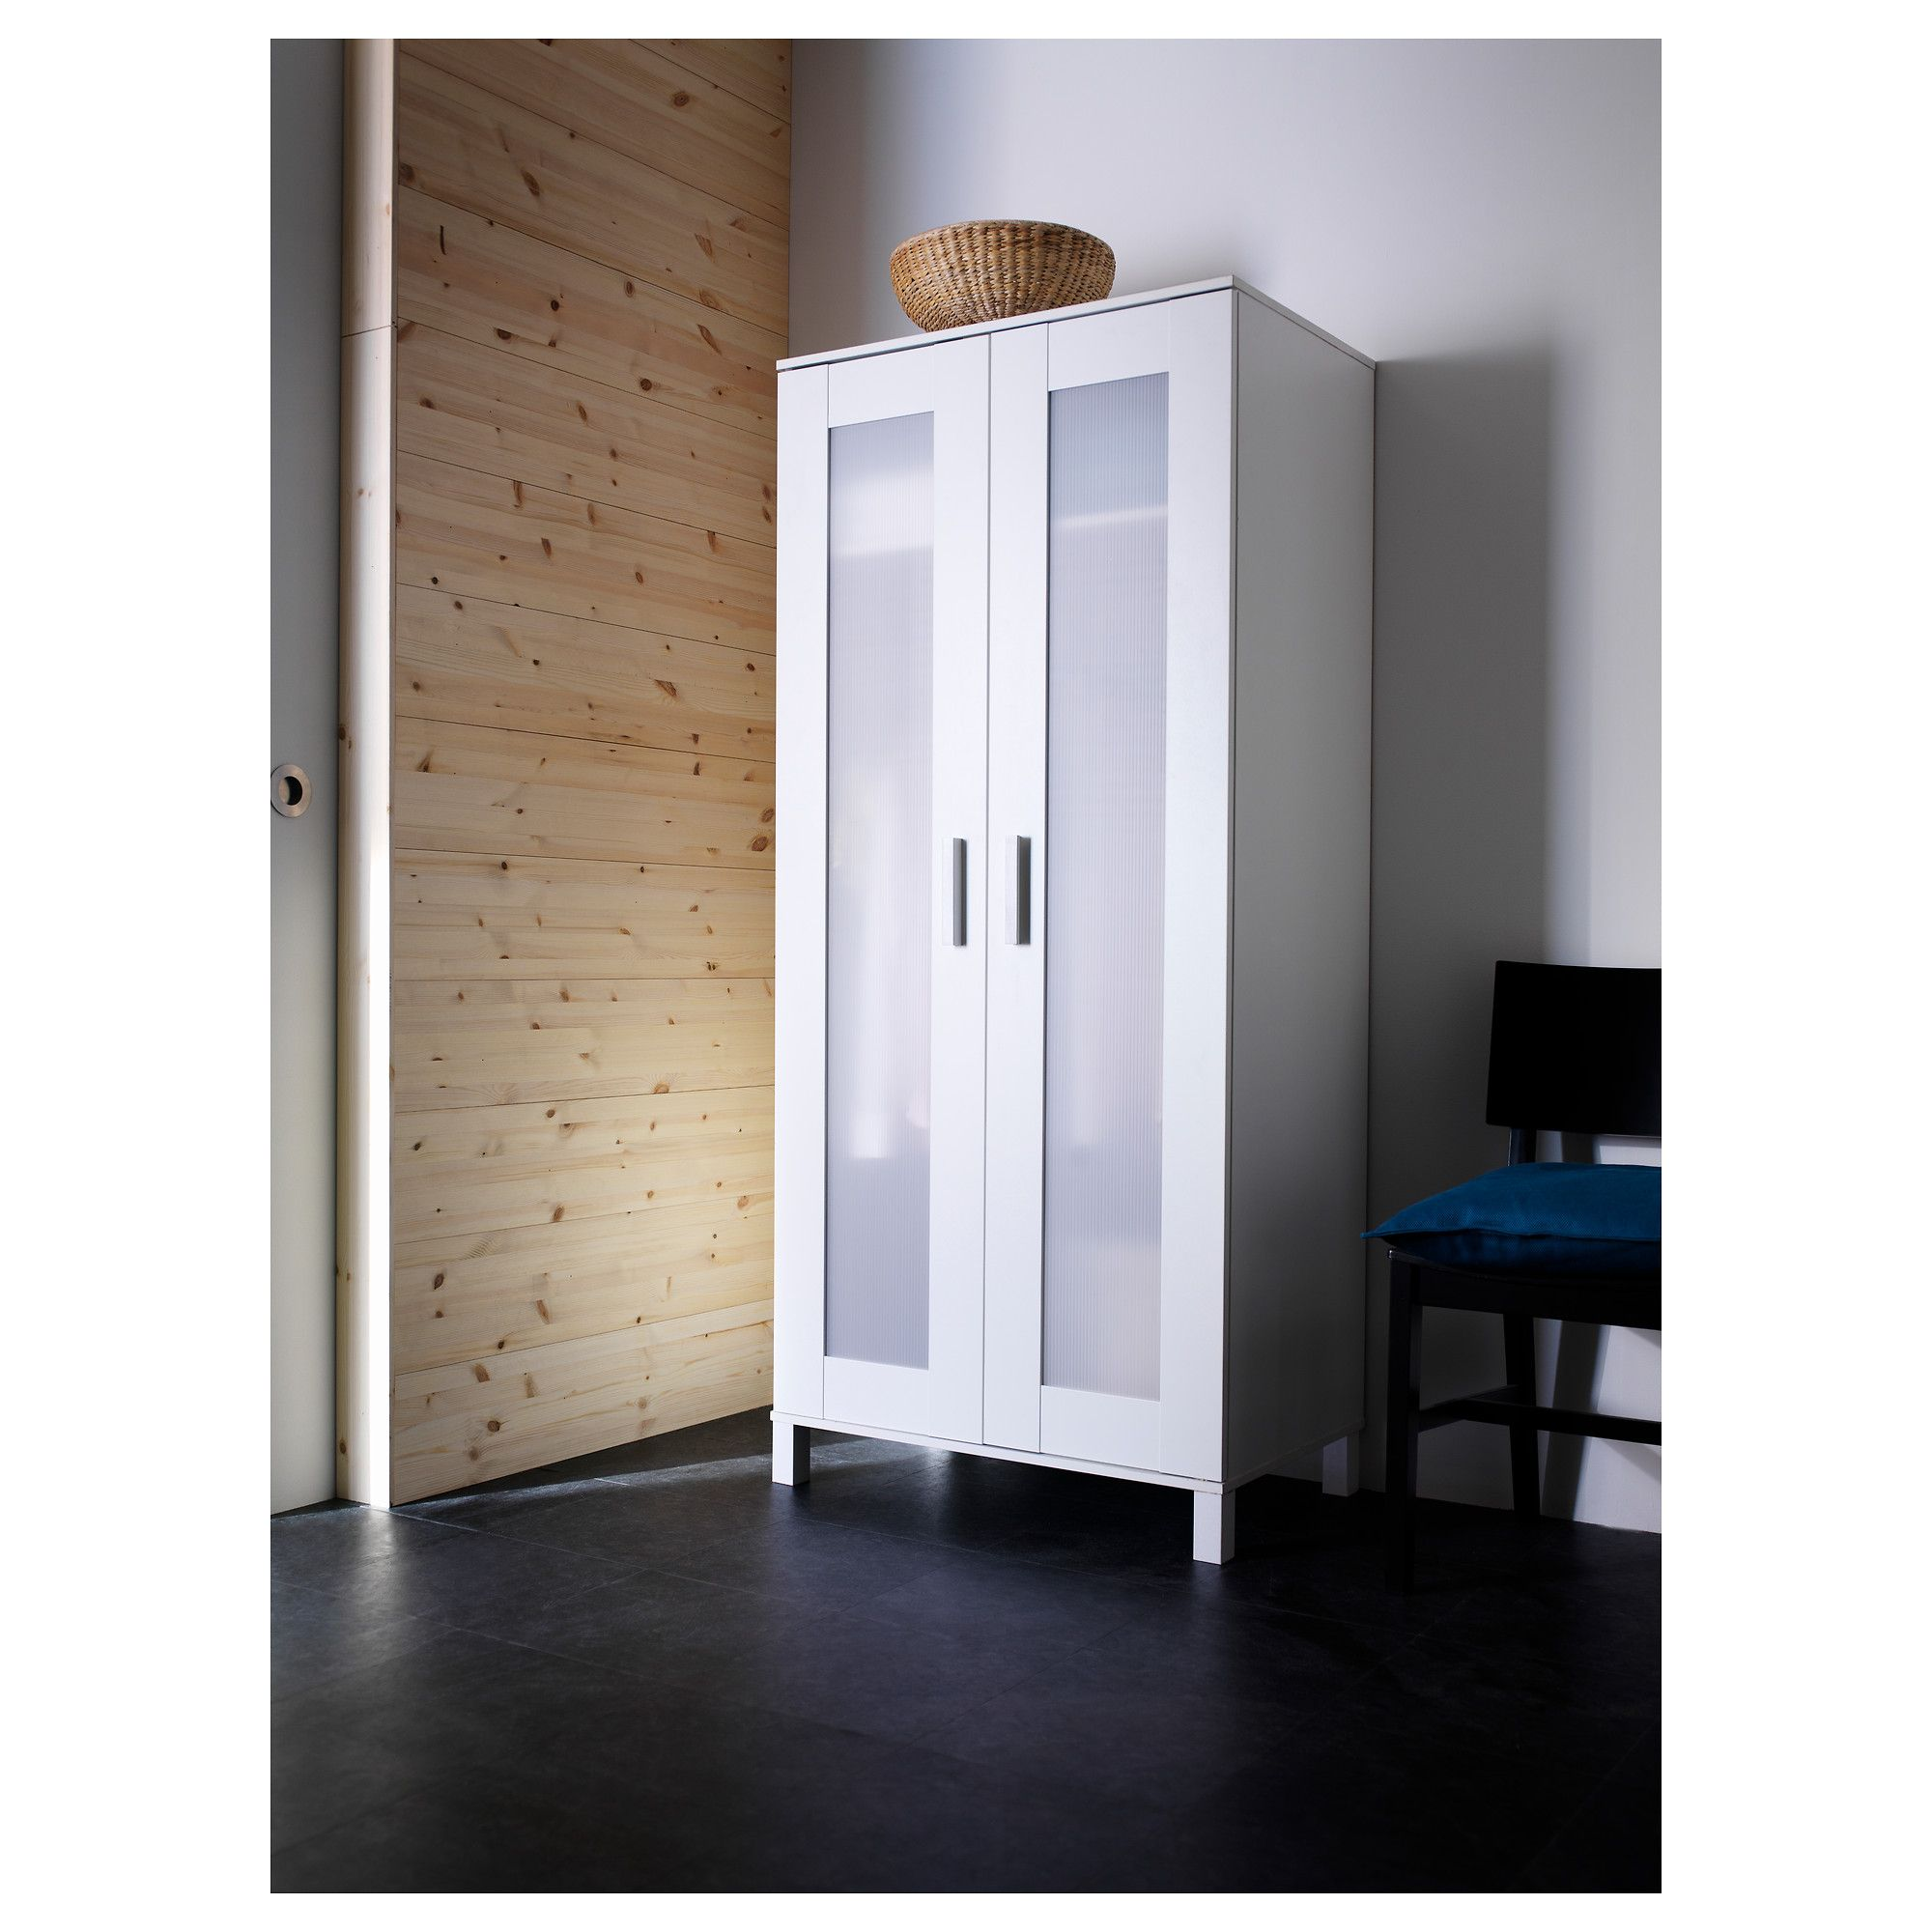 ANEBODA Ντουλάπα - IKEA   IKEA love   Pinterest   Aneboda wardrobe ...